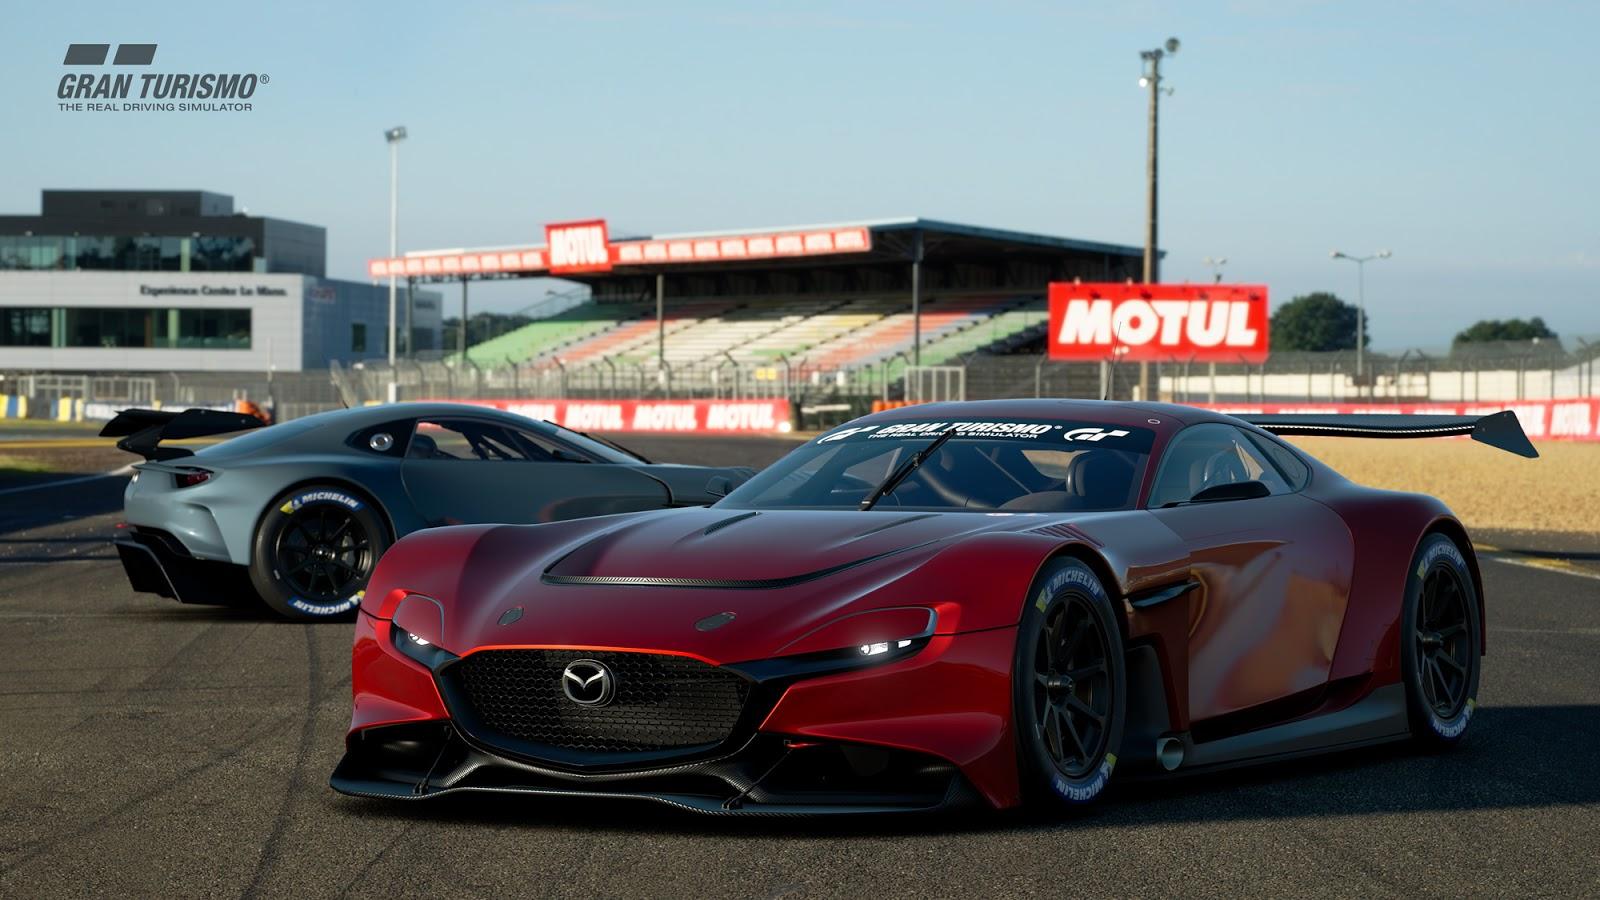 202005 rxvgt3pk rxvgt3 sarthe 01 1 To Mazda RX-Vision επιστρέφει (στο Playstation) Mazda, Mazda RX-7, Mazda RX-Vision Concept, Mazda RX8, zblog, αγωνες, ΦΩΤΟ, φωτογραφίες